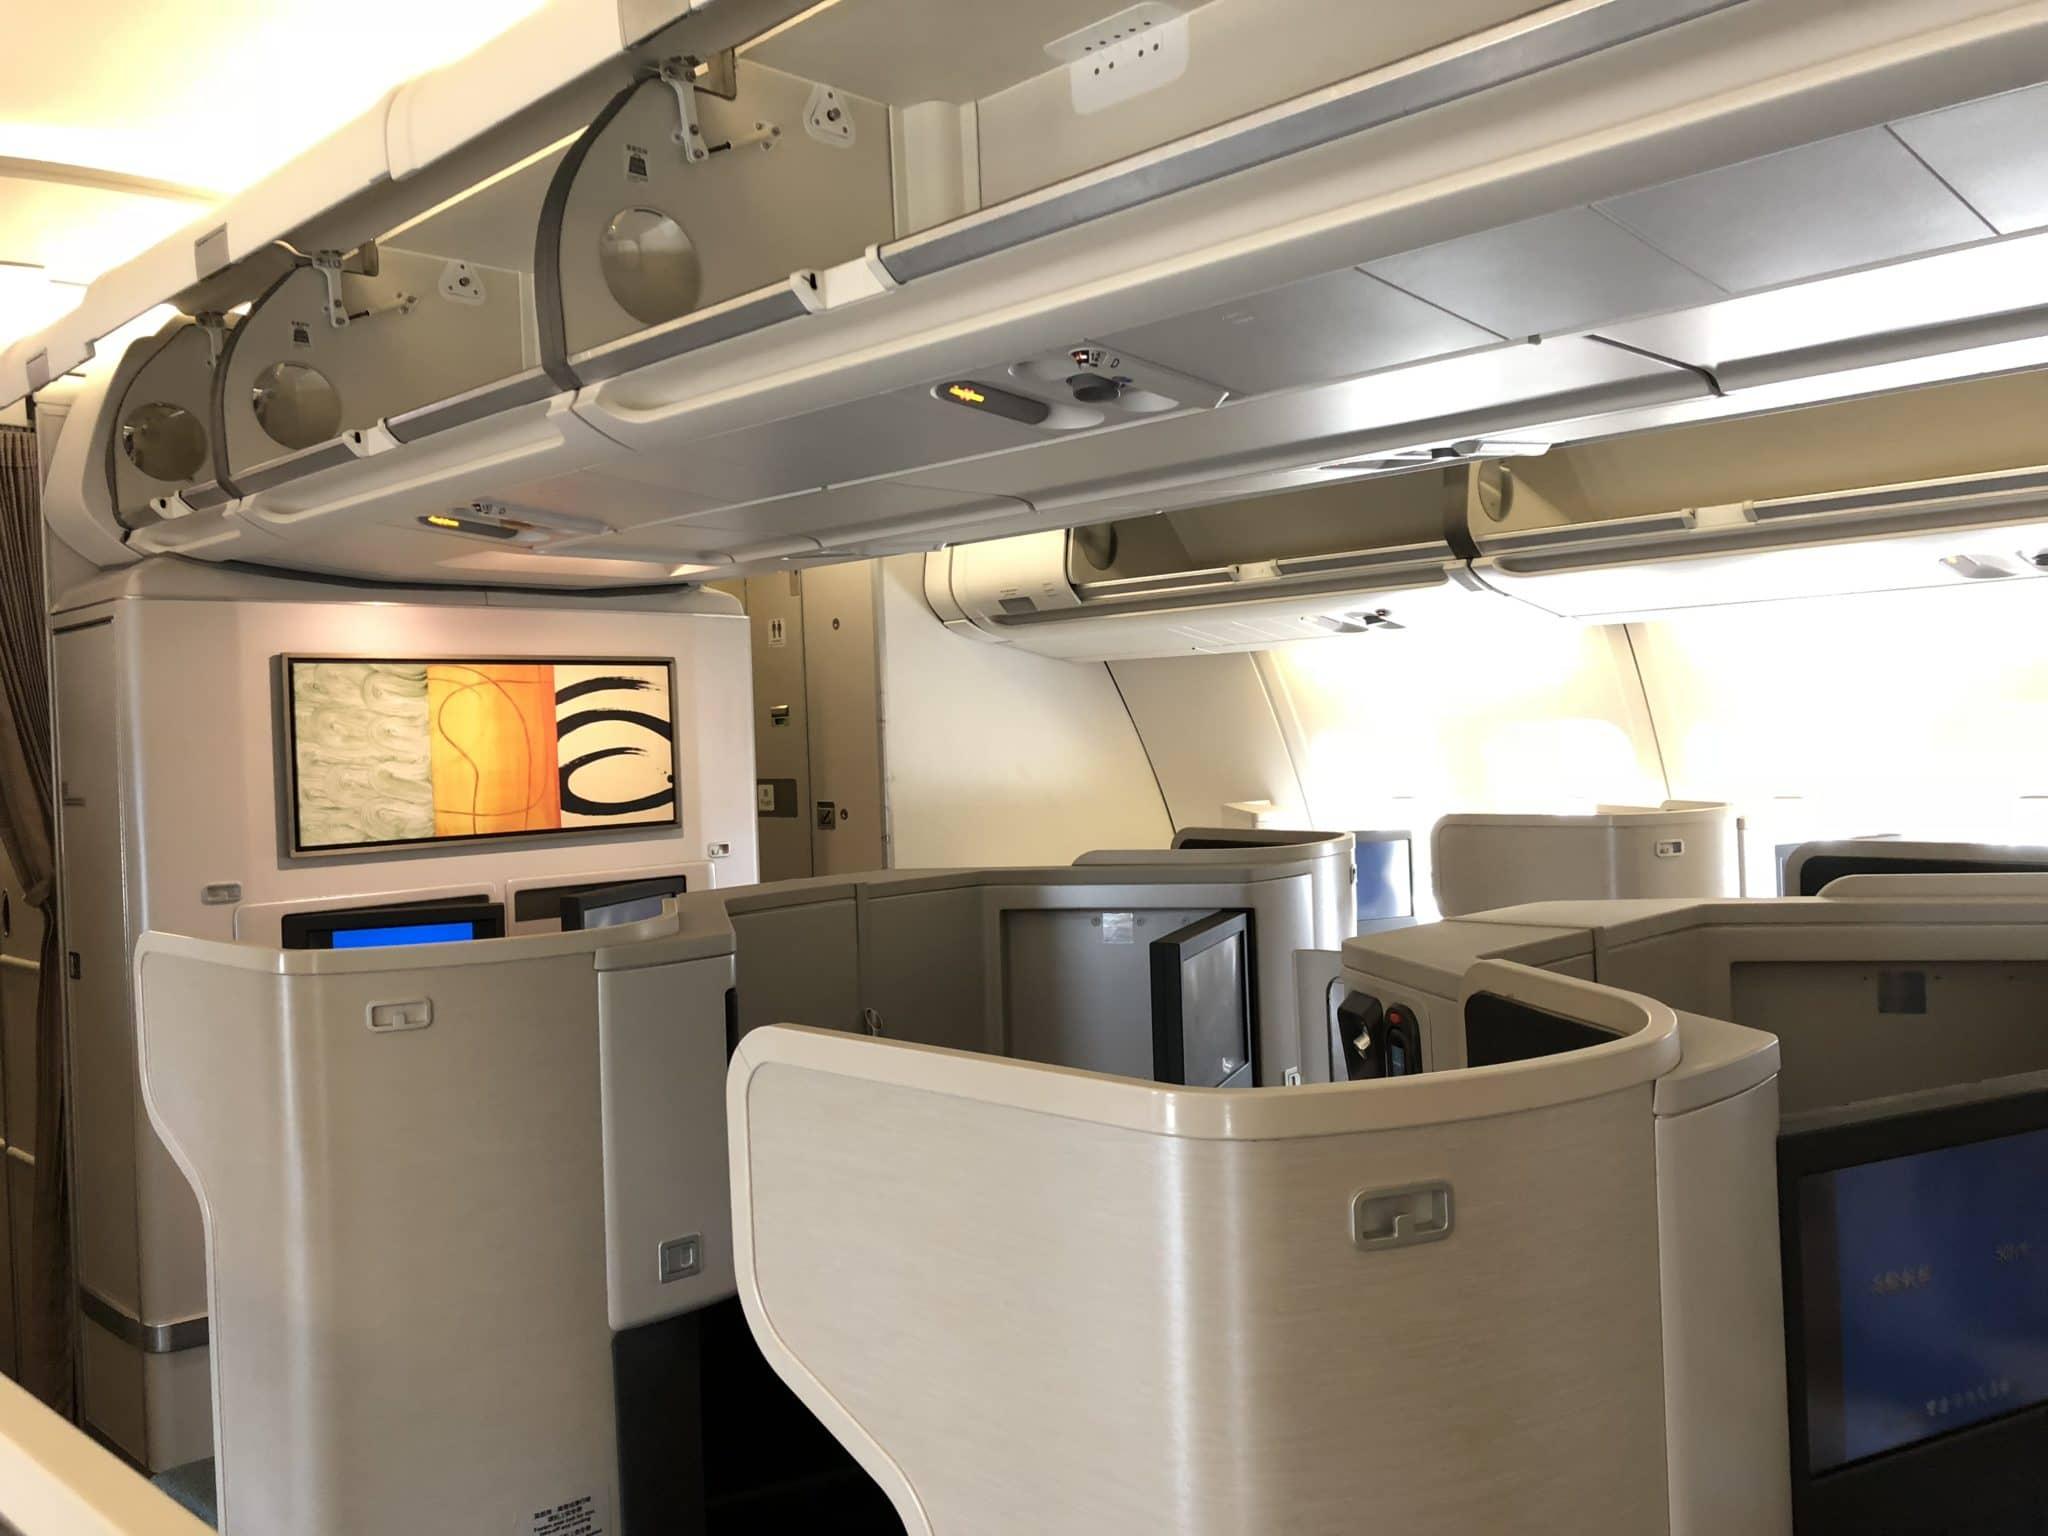 Cathay Pacific Business Class A330 Kabine von hinten